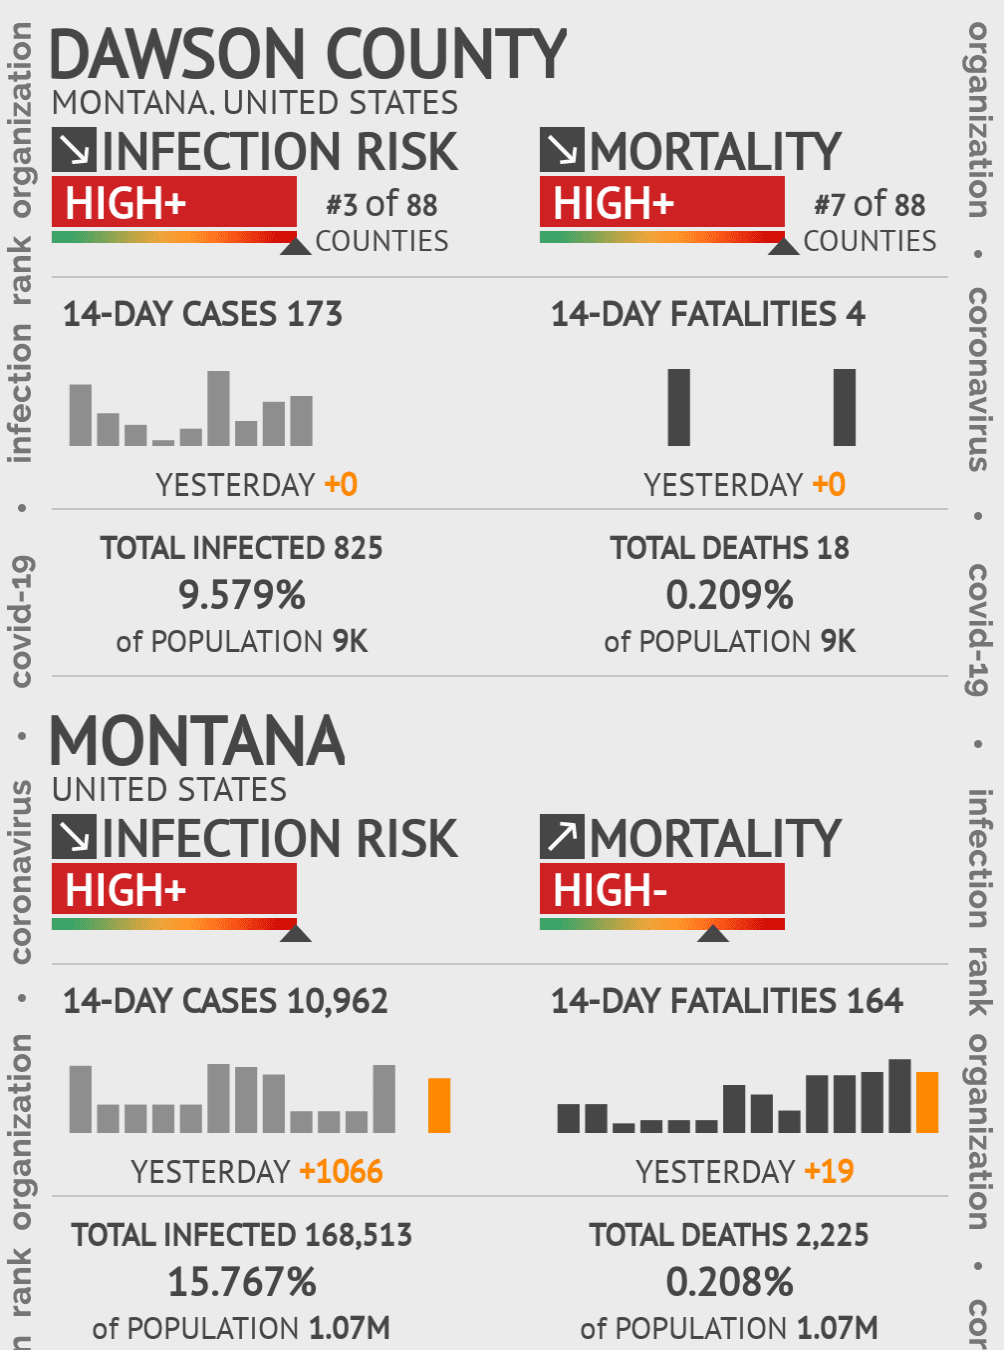 Dawson County Coronavirus Covid-19 Risk of Infection on December 18, 2020